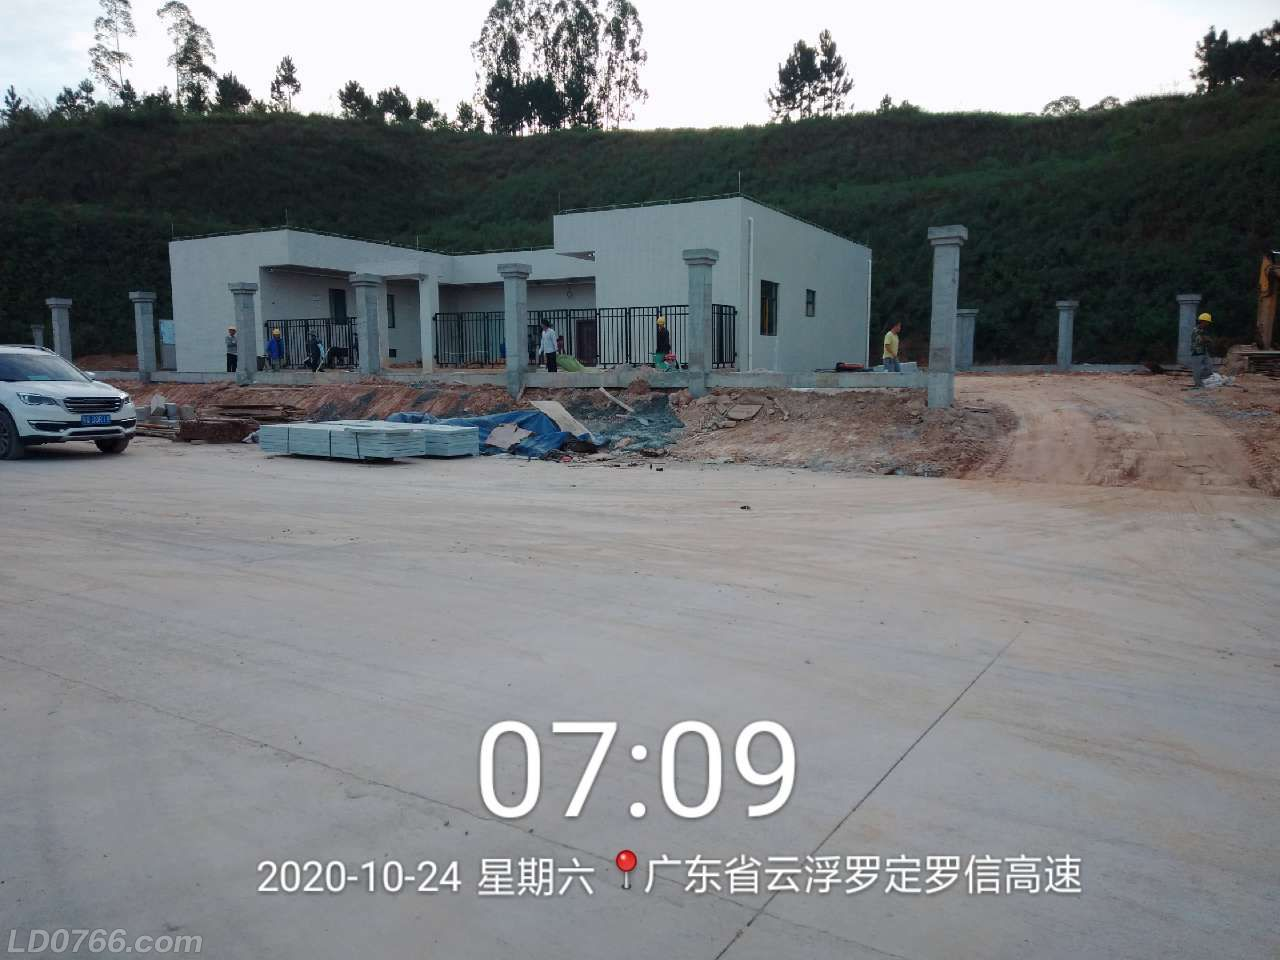 front2_0_Fmu-Bc_RscE6PauHVL2RFUVzA-gN.1603496878.jpg